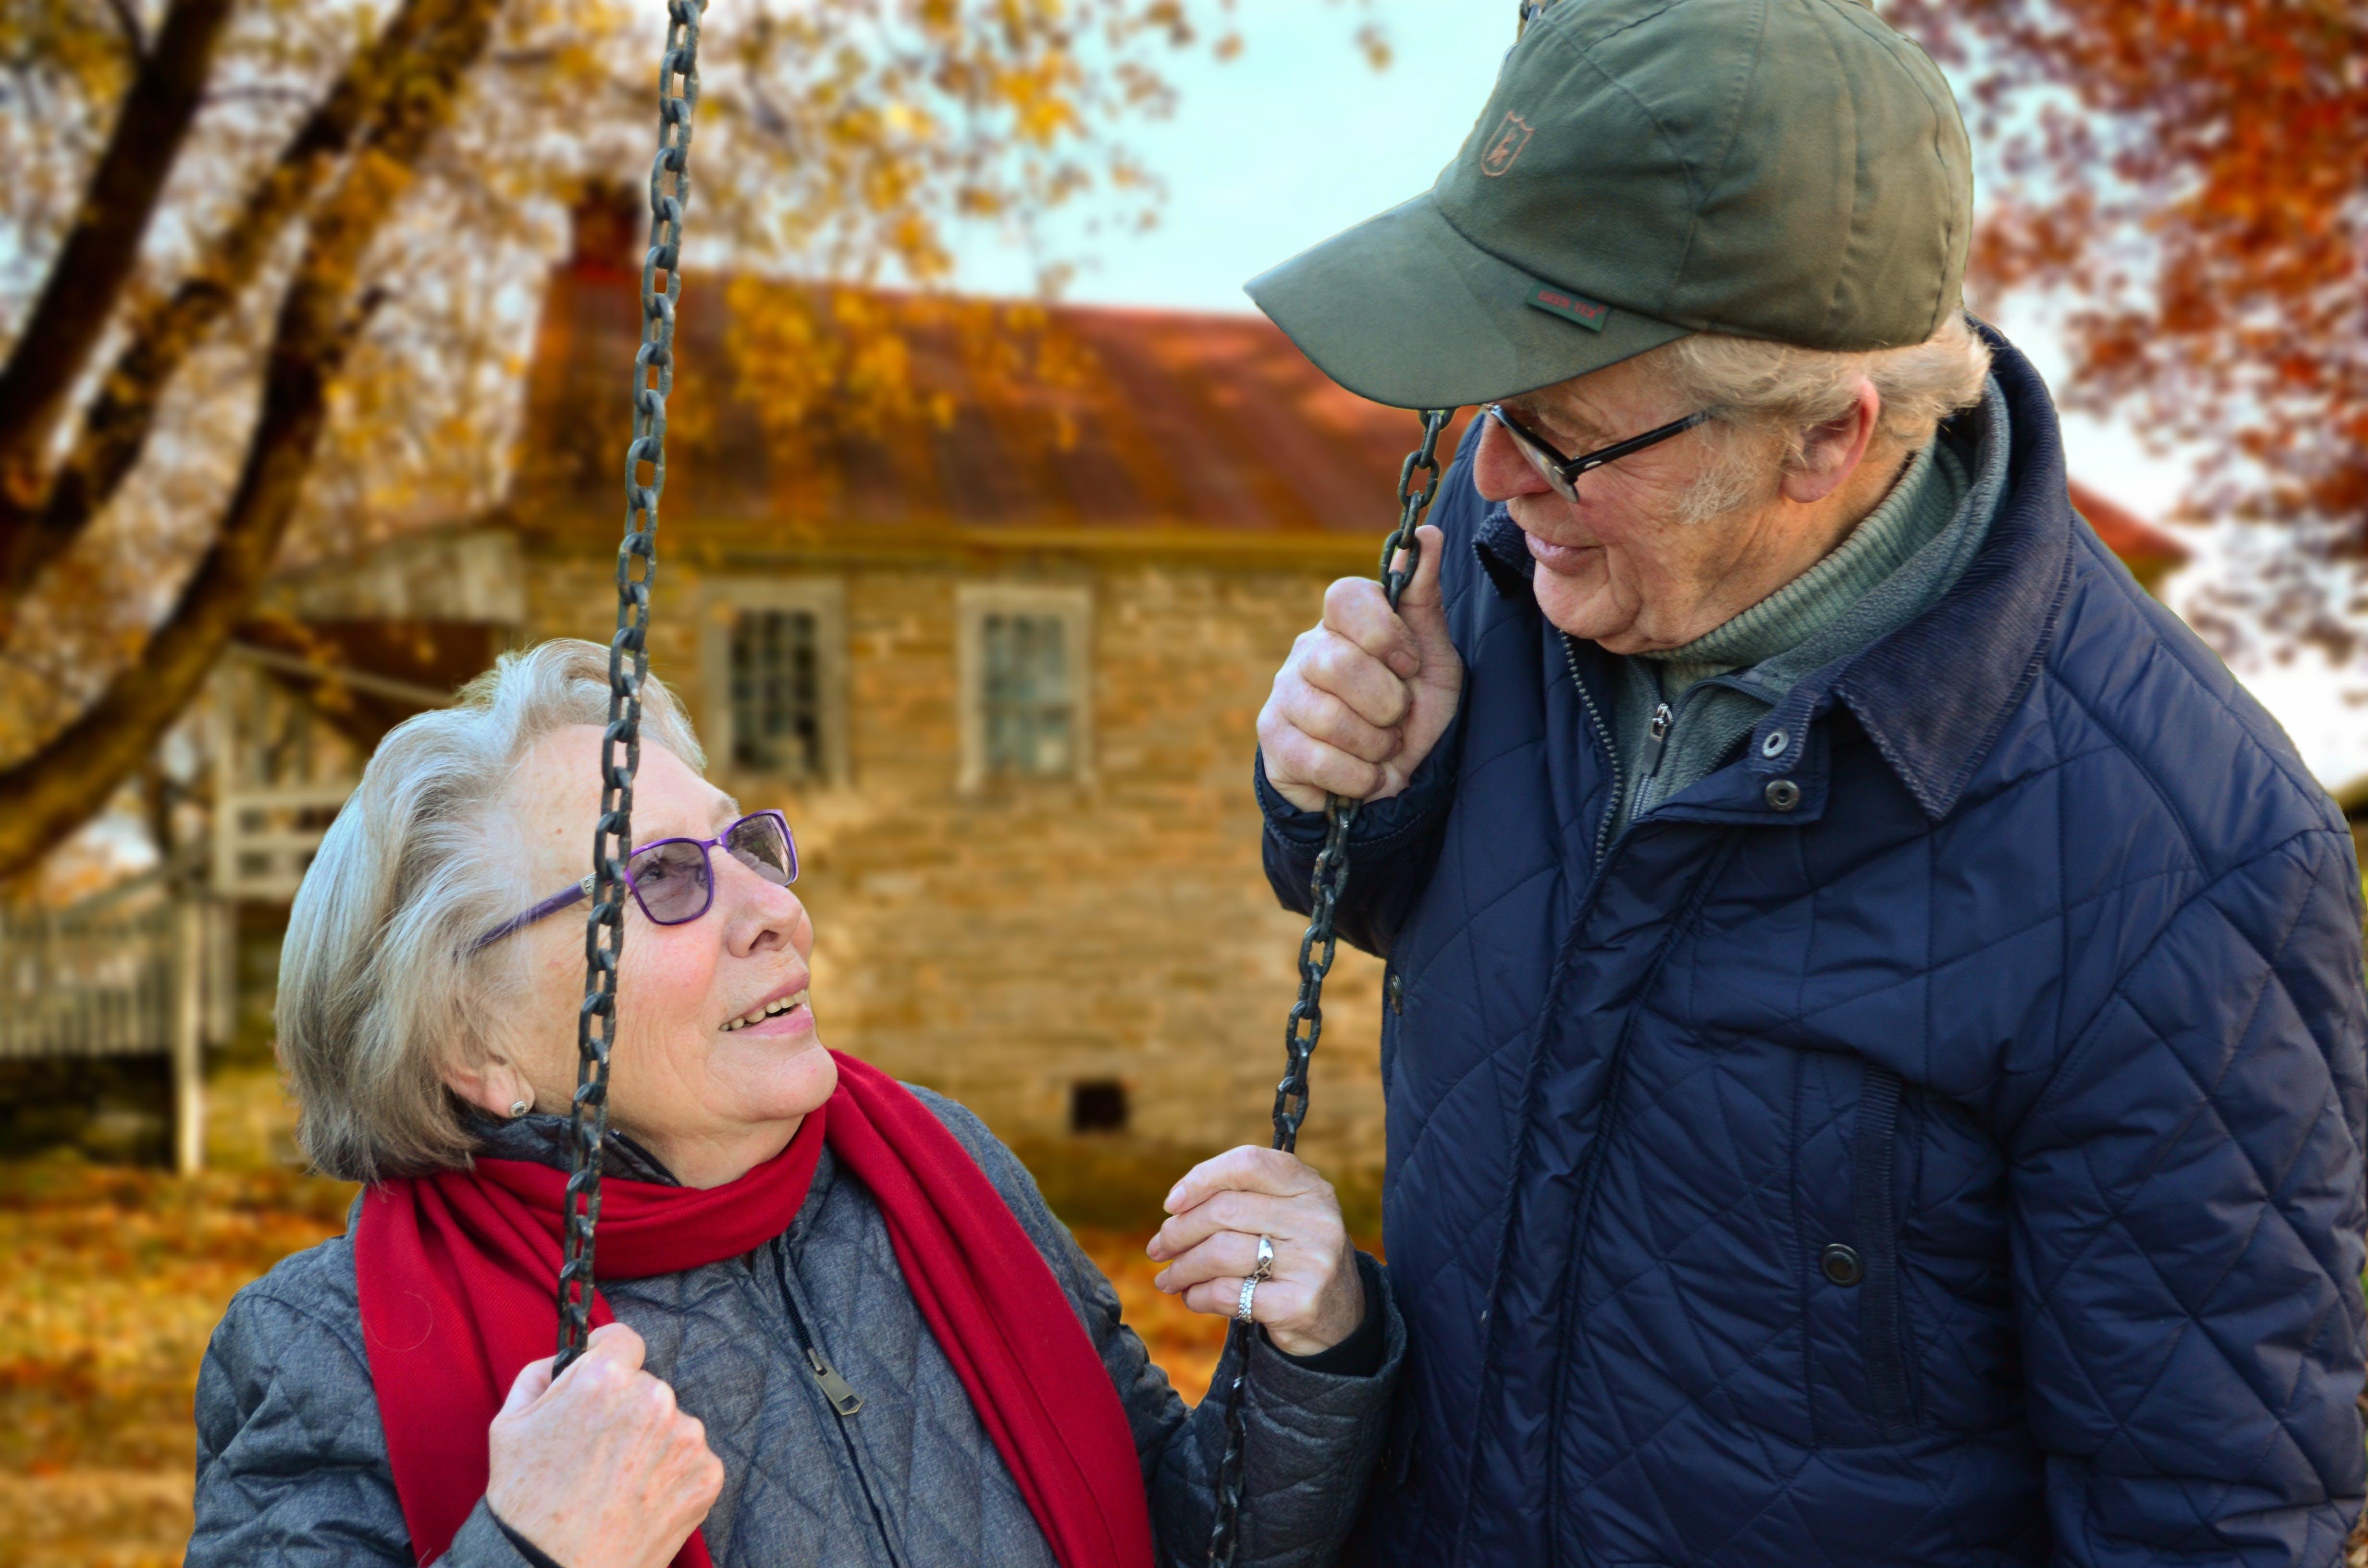 Man standing beside a woman on swing | Photo: Pexels